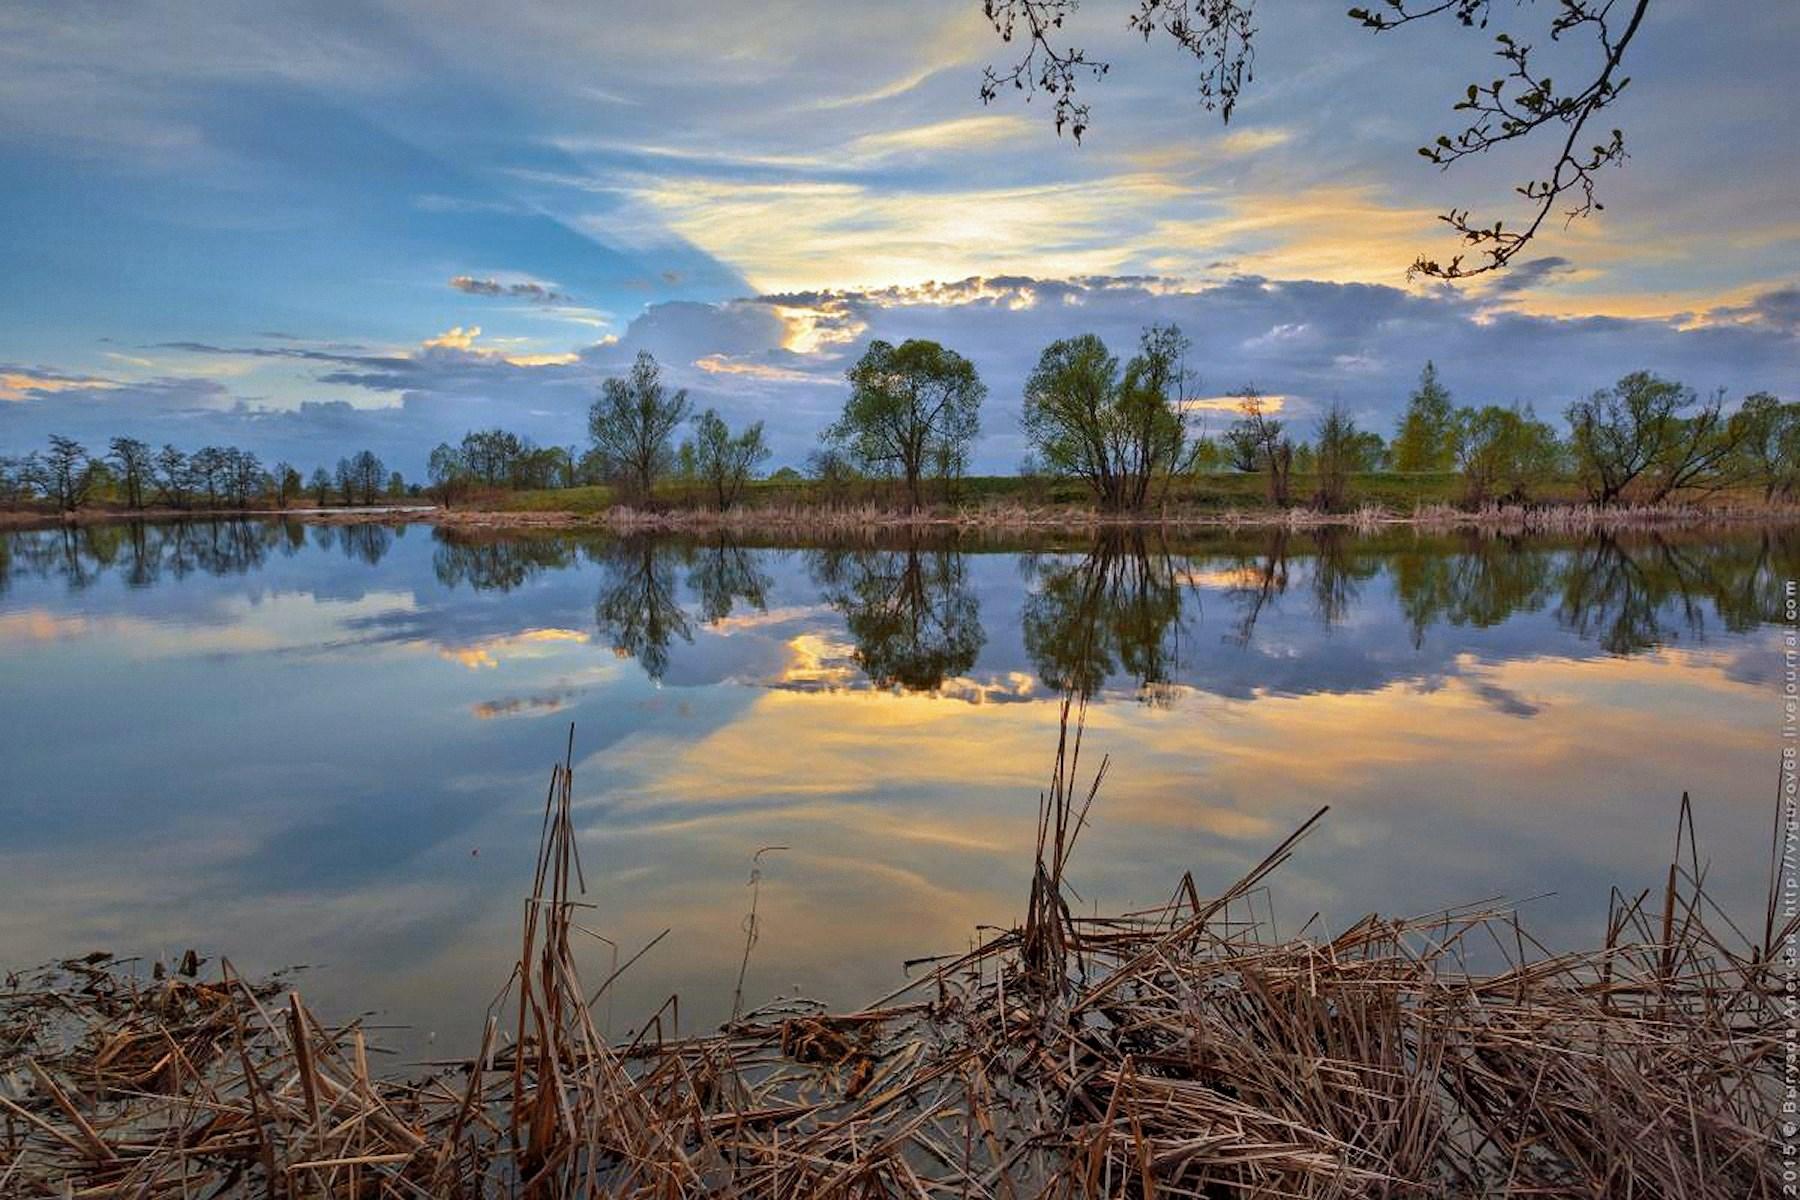 00 Vyasceslav Gilyov. River Tsna in Tambov Oblast. 2015